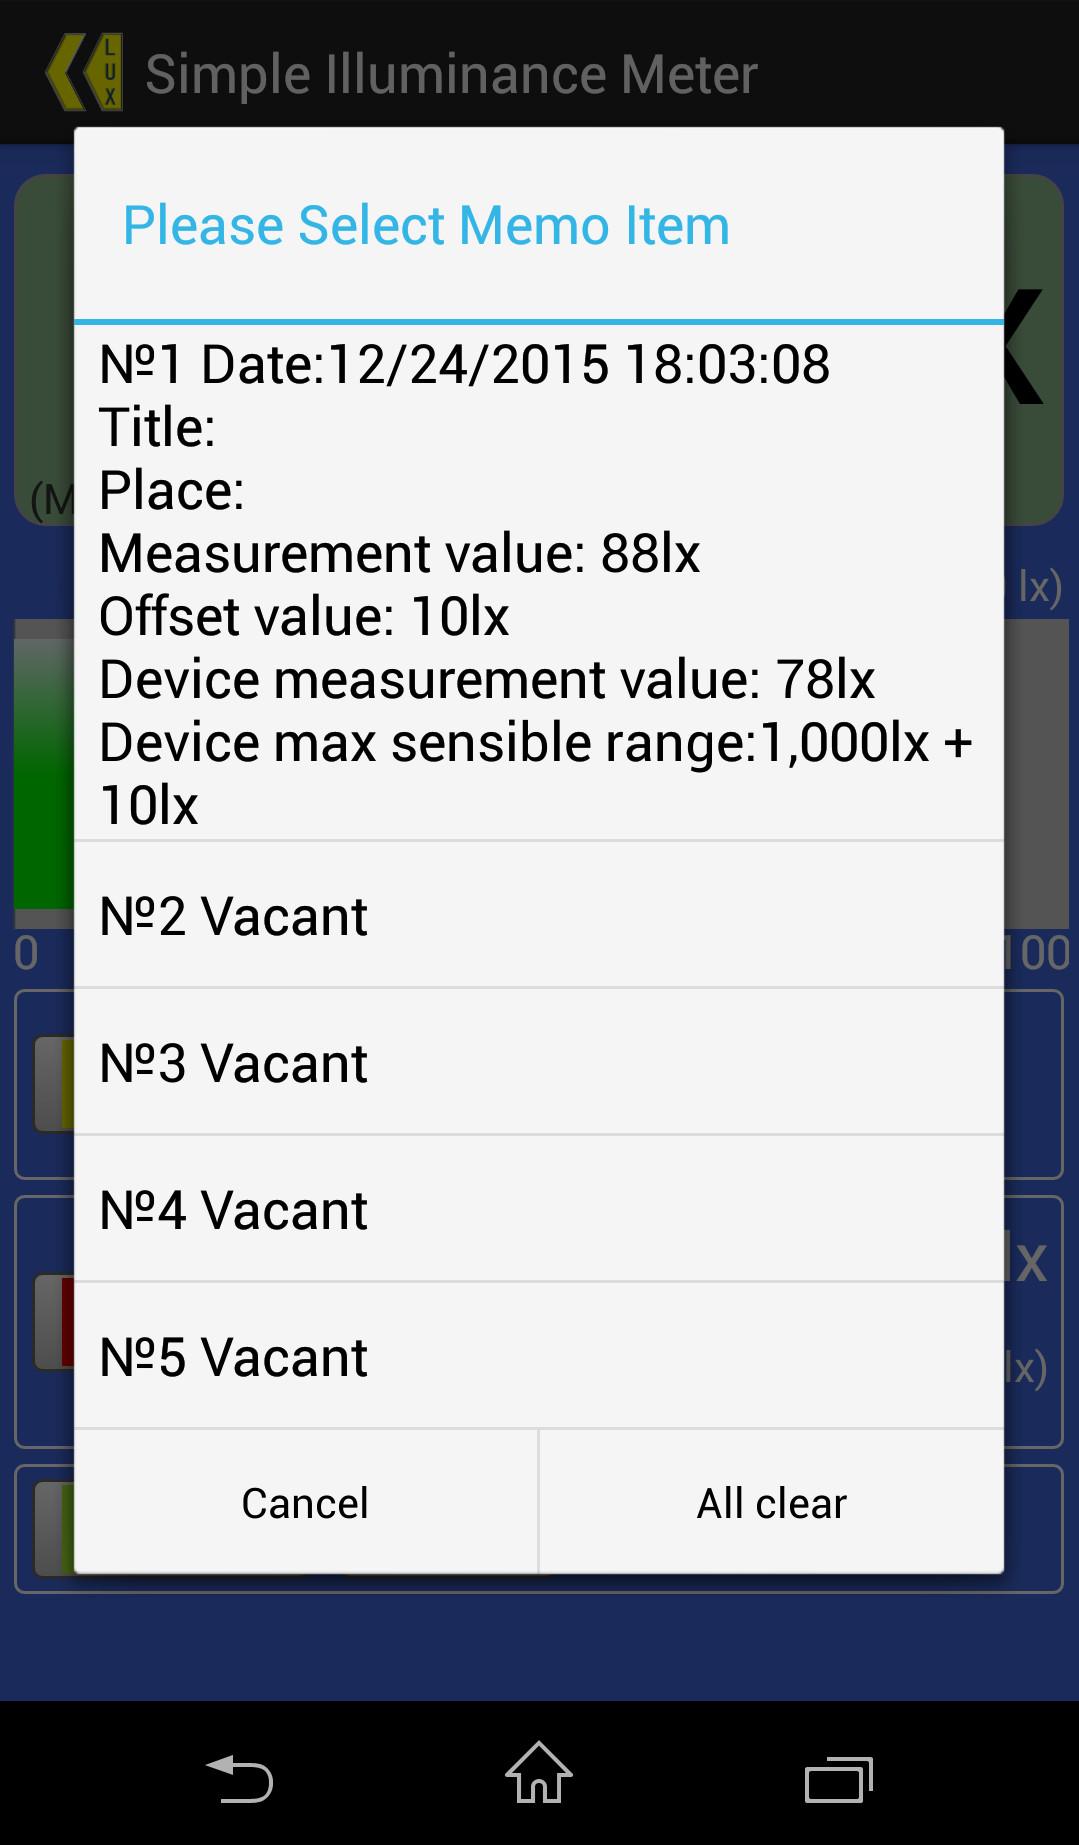 Simple Illuminance Meter